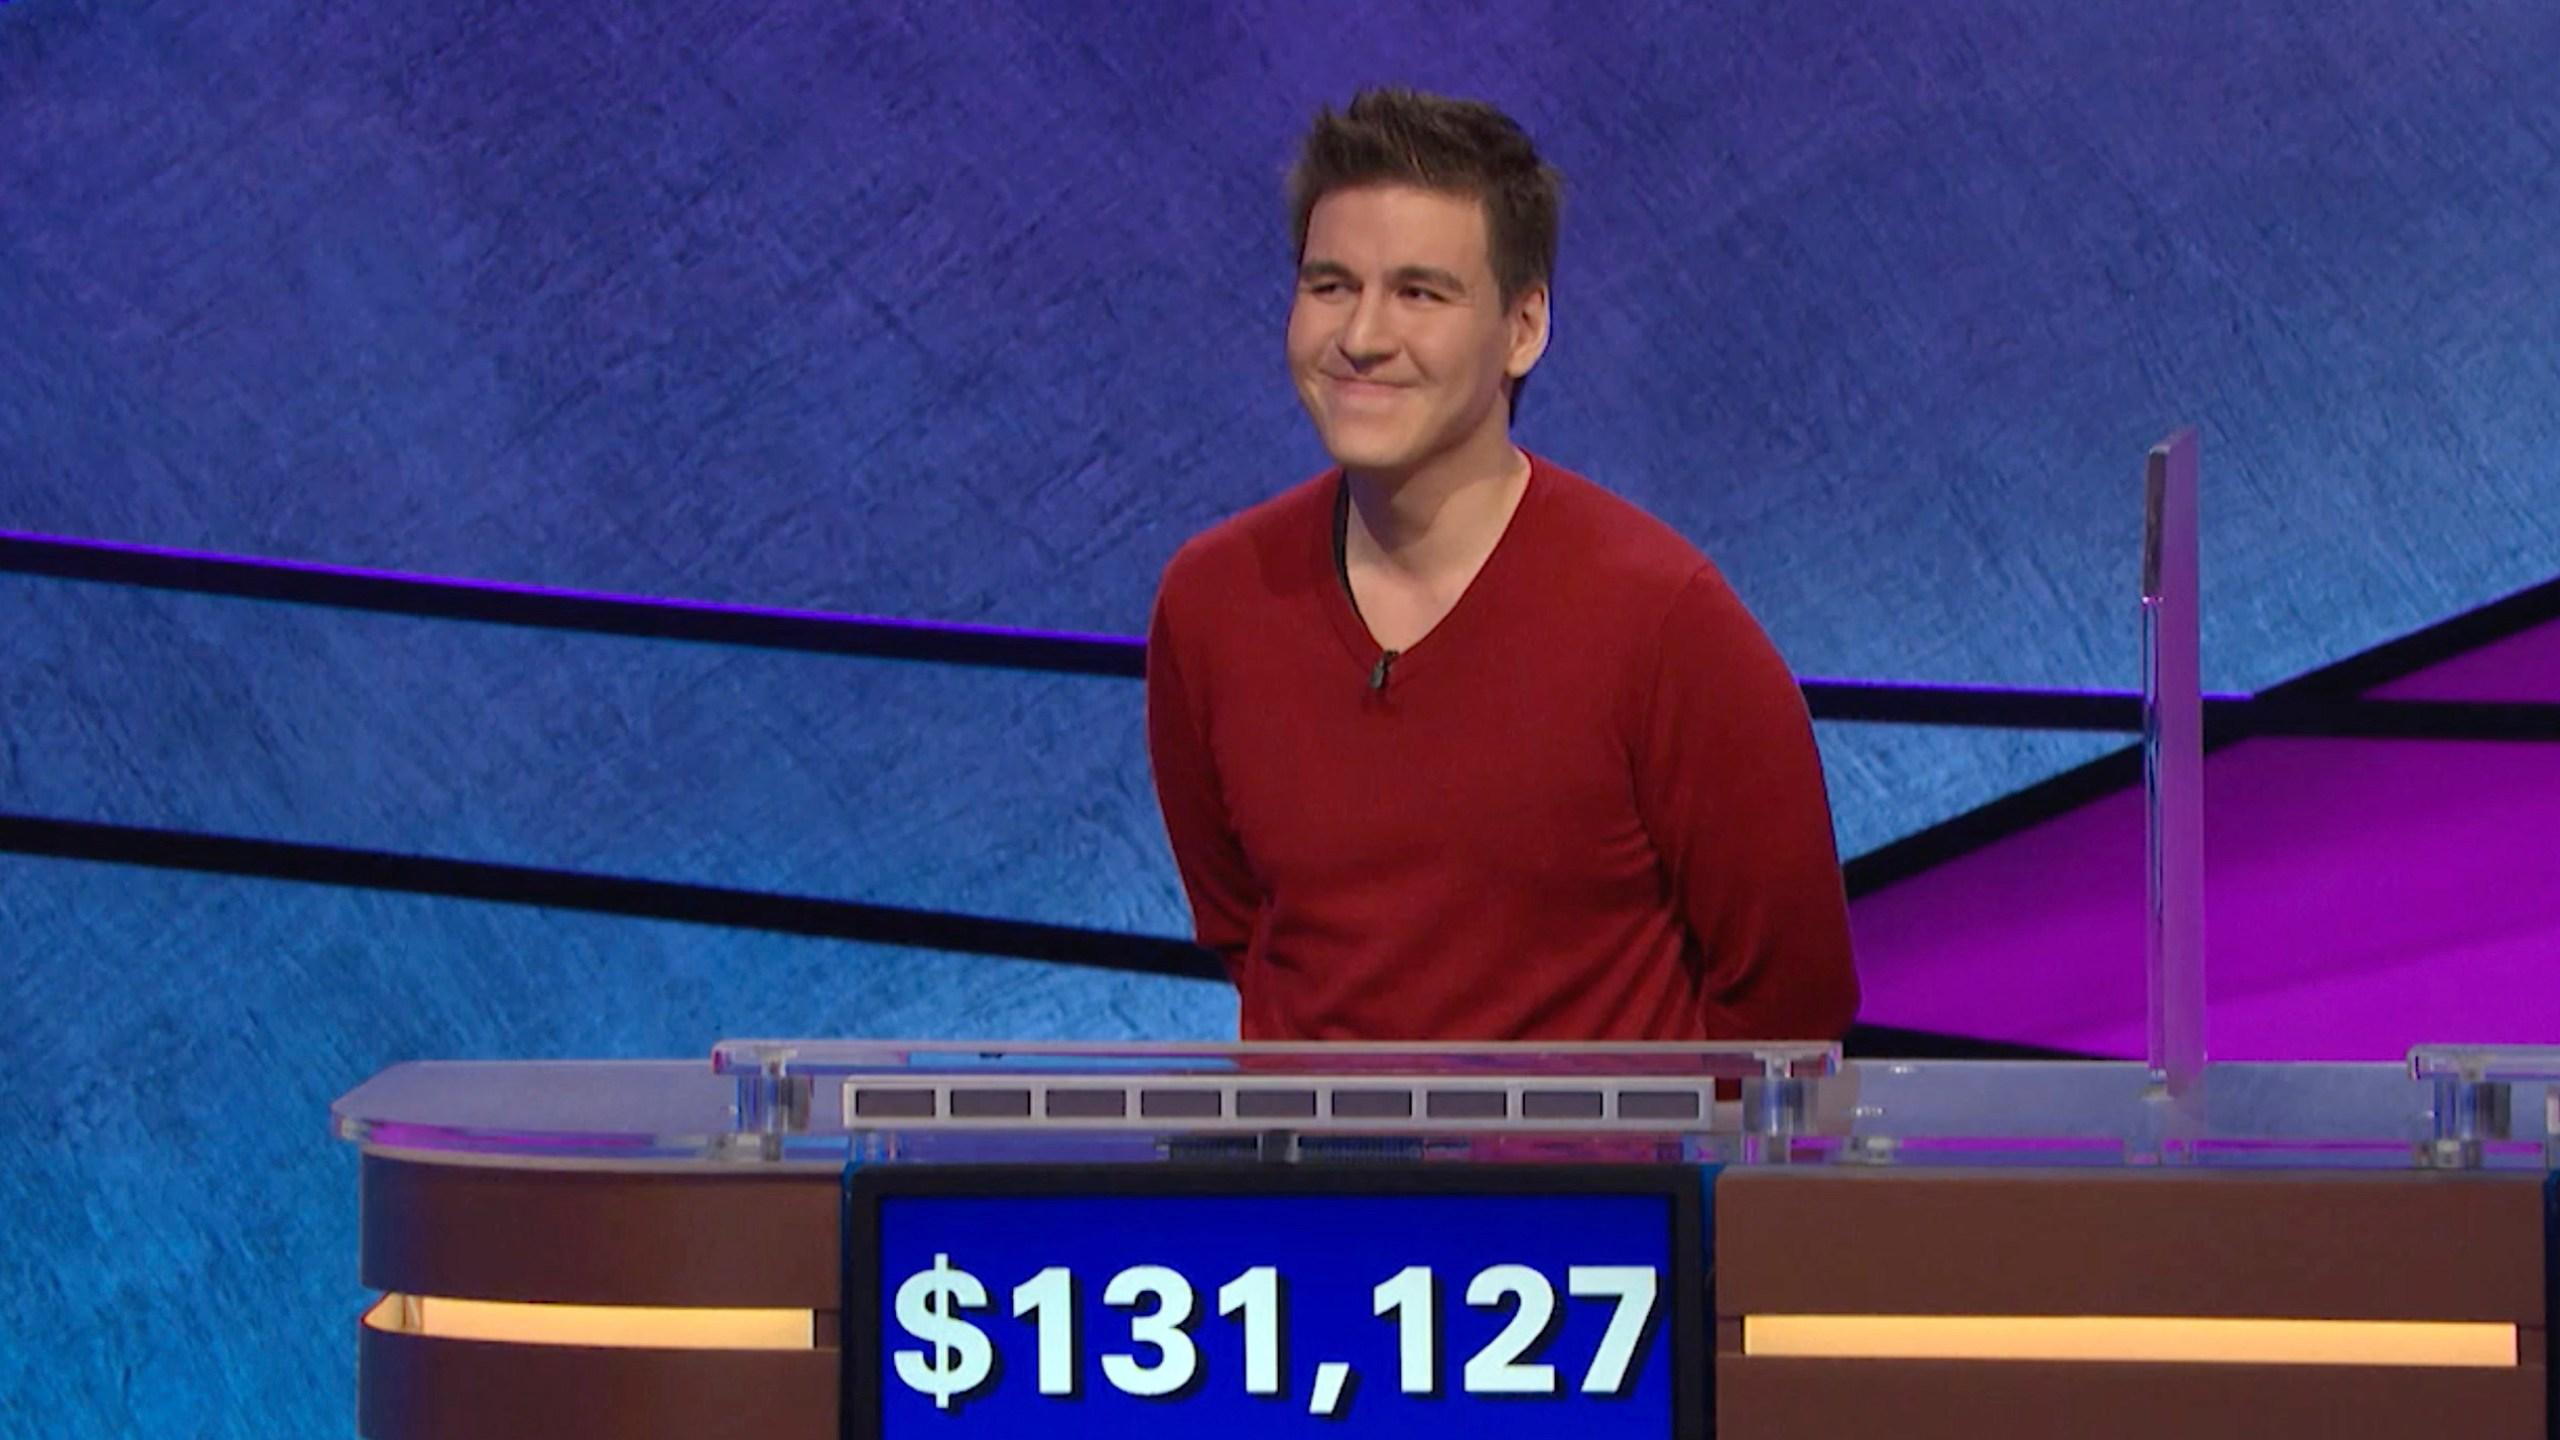 TV_Jeopardy_Champ_06311-159532.jpg89210592